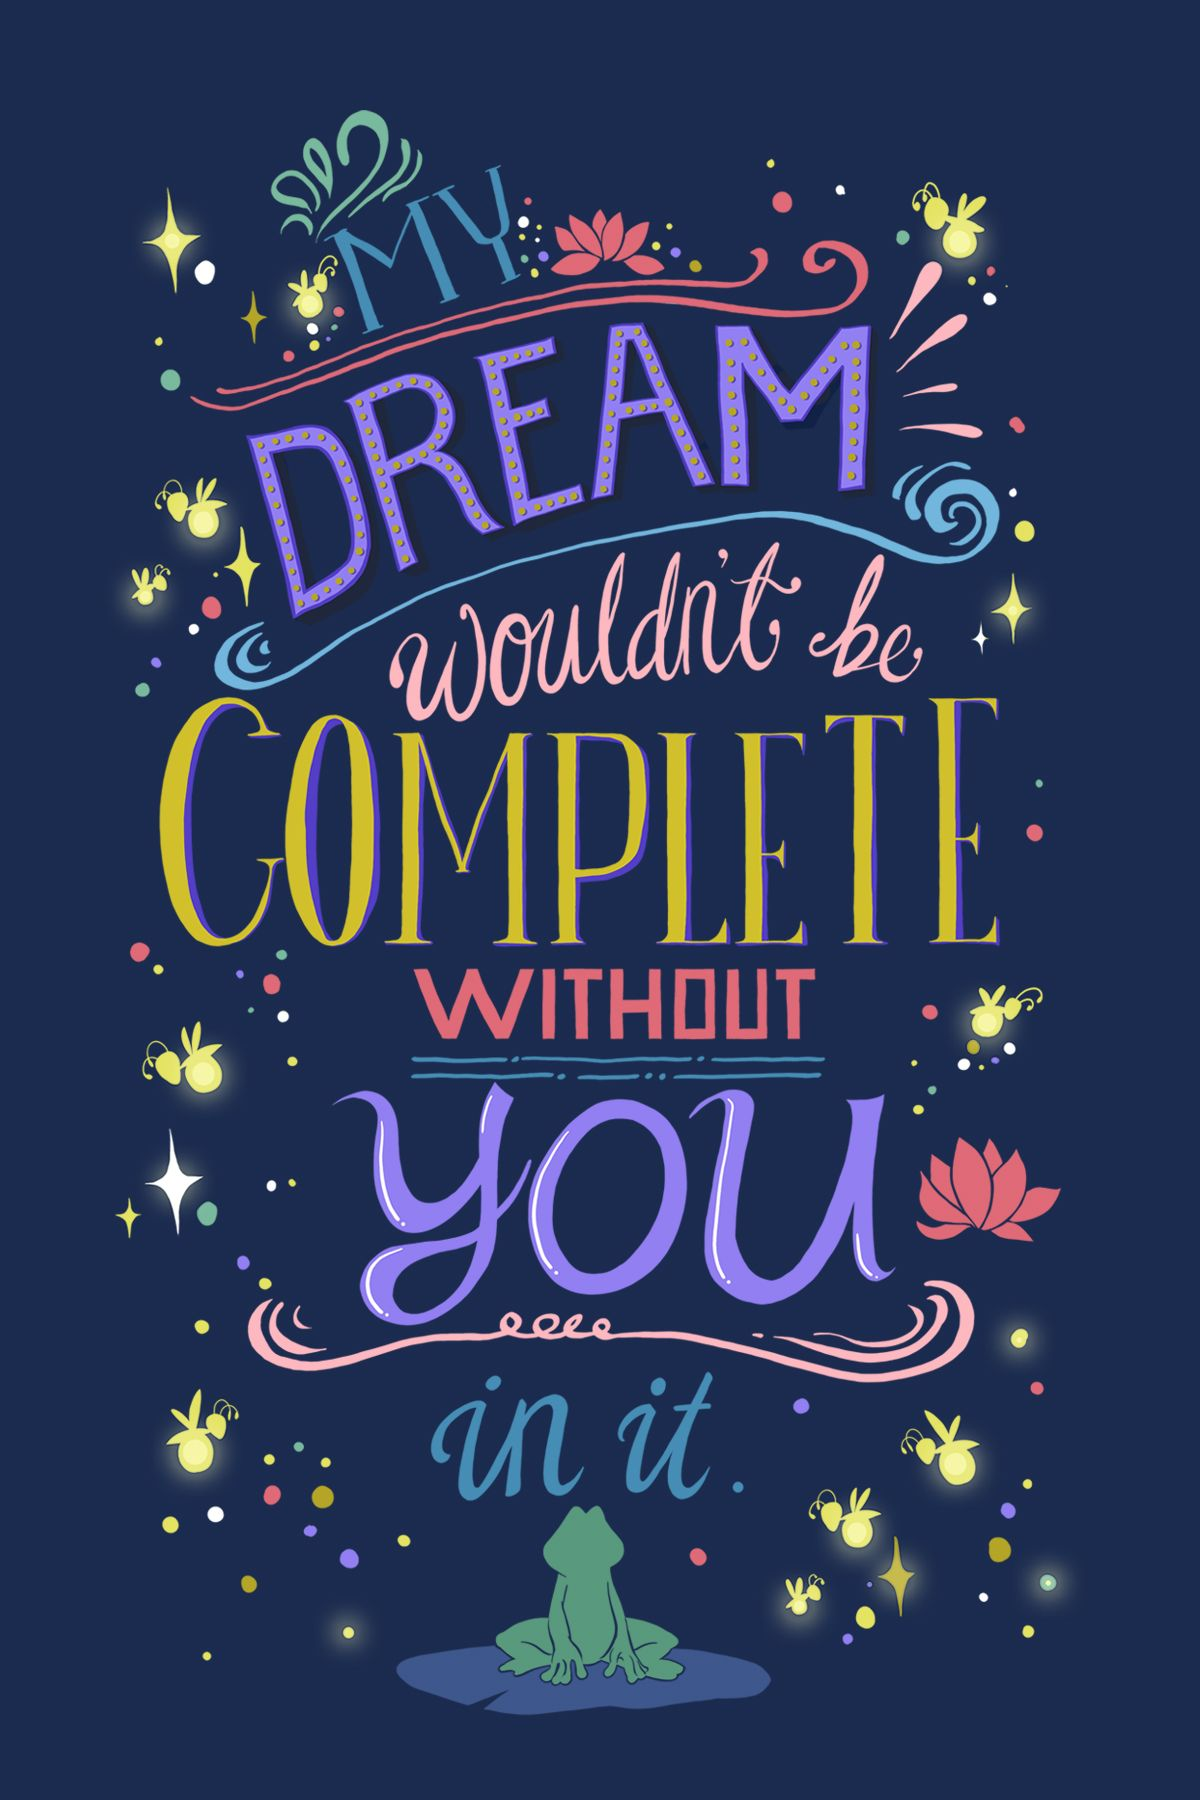 Disney Love Quotes Enchanting Http68Diatumblr17A6E4Da61566F23Feac4D7C6C5E7C93